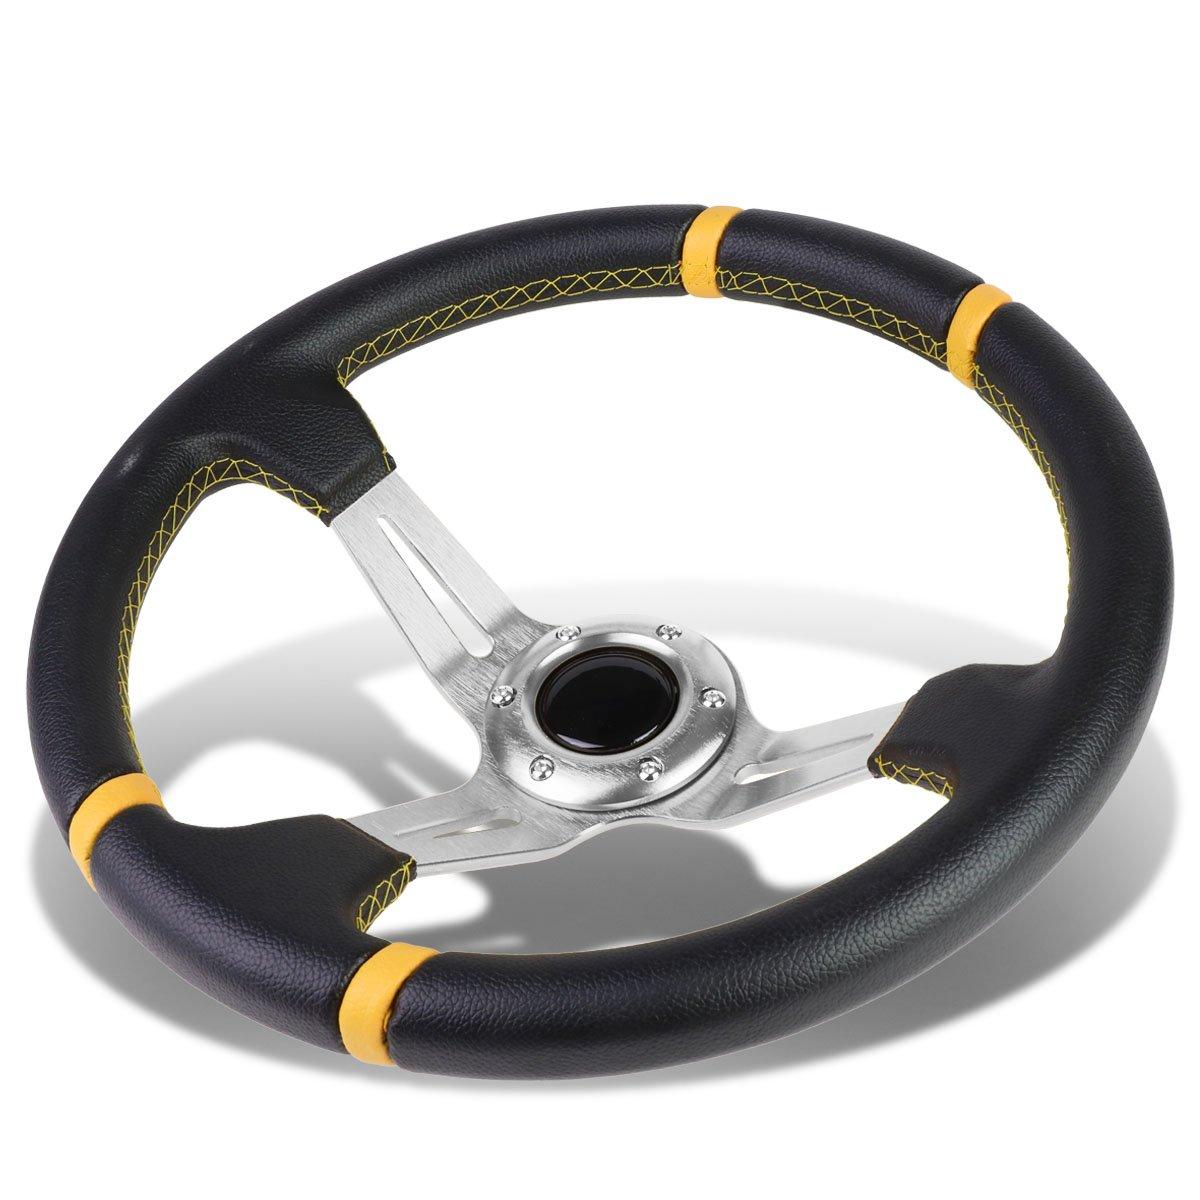 Aluminum Frame Vinyl Leather Cover 350mm 6-Bolt Steering wheels + Horn Button (Gold Spoke/Gold Stripe) Auto Dynasty